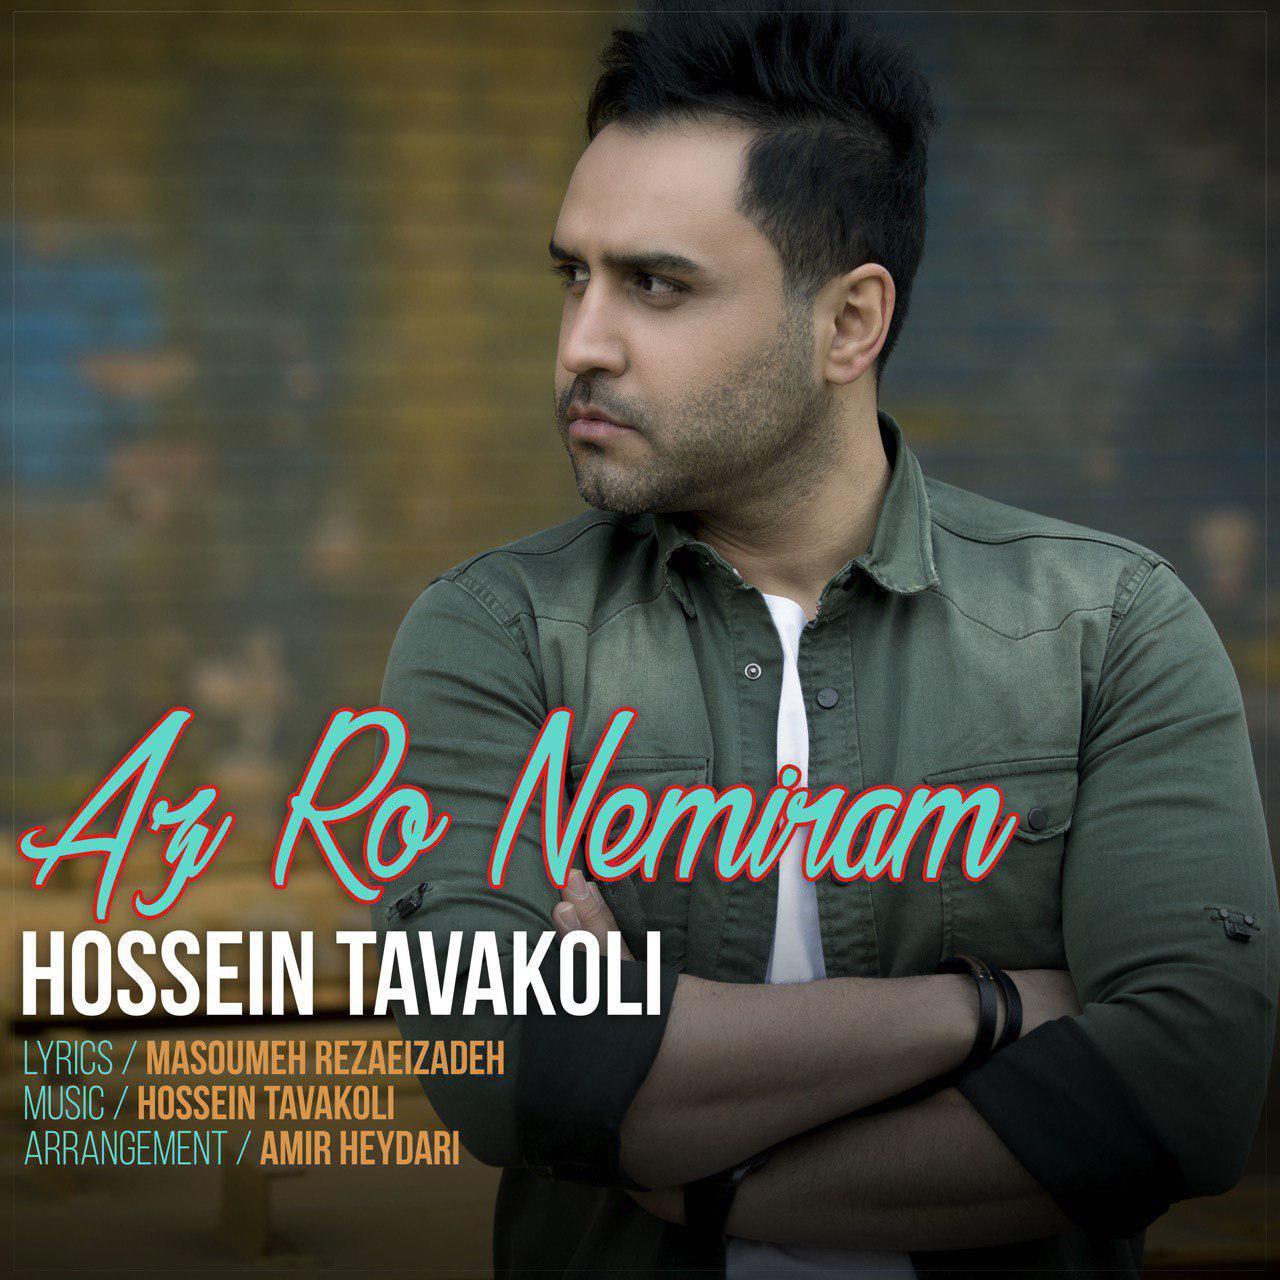 Hossein Tavakoli - Az Ro Nemiram Music | آهنگ حسین توکلی - از رو نمیرم